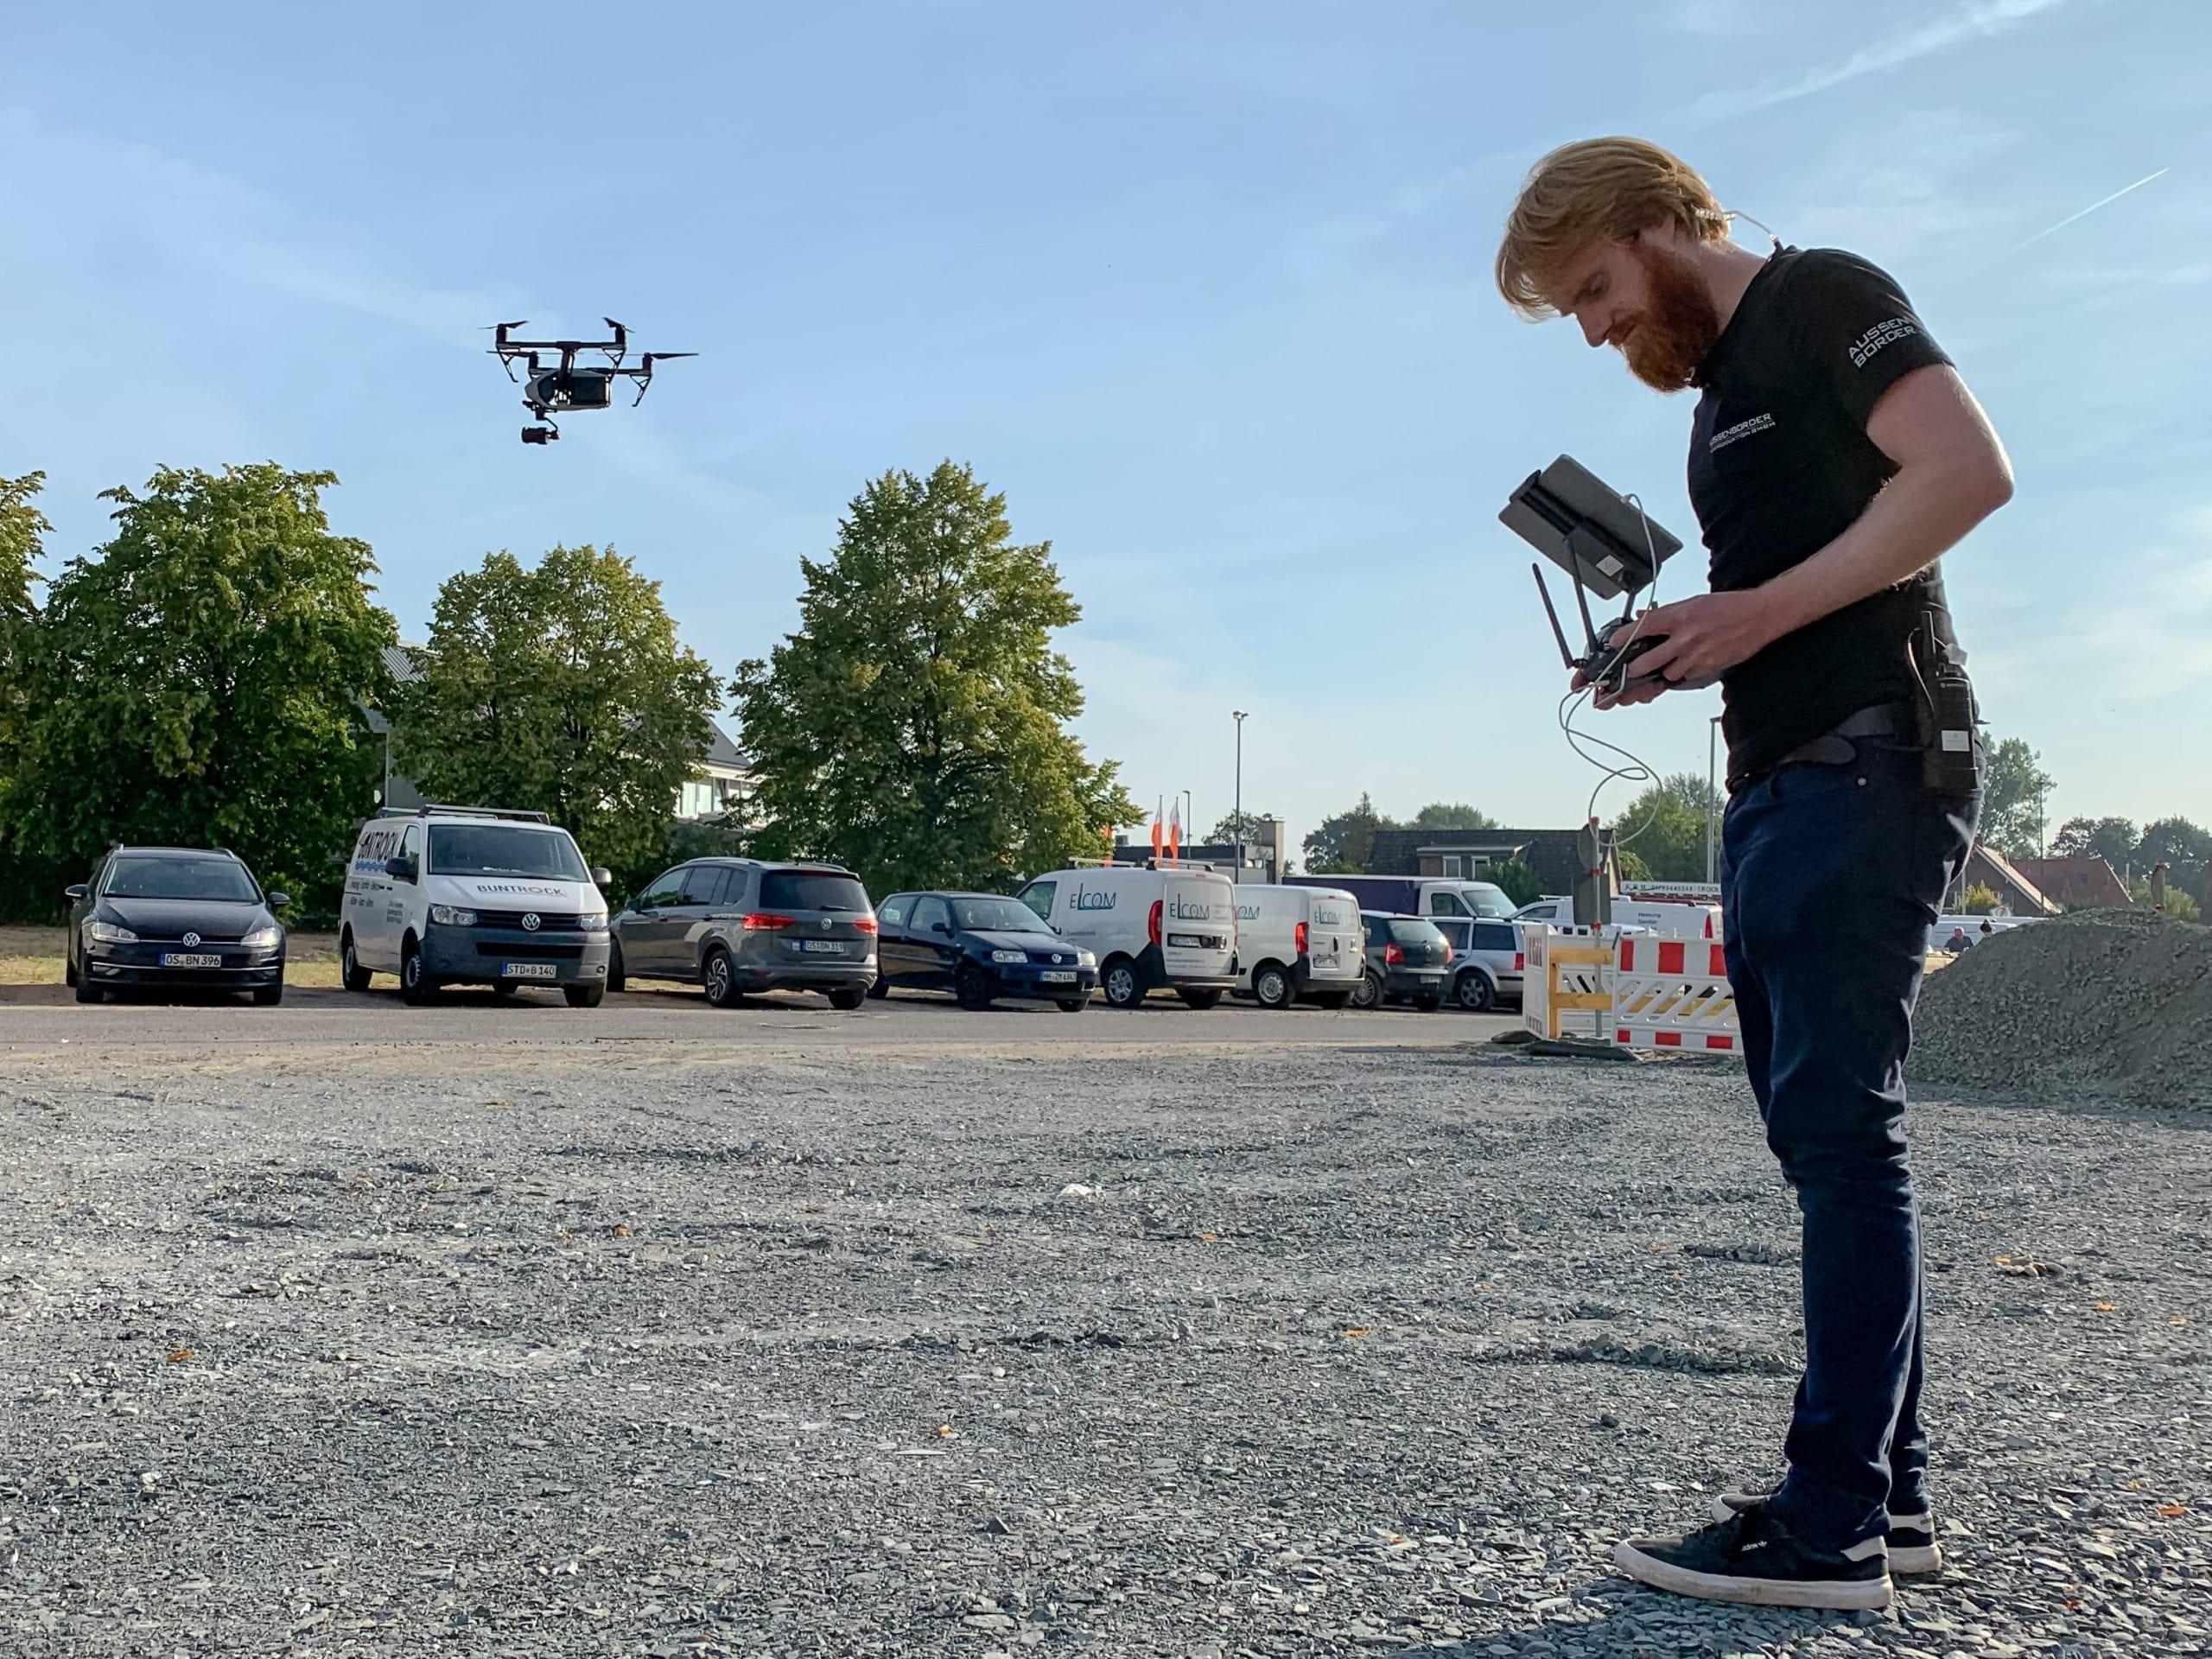 Droneoperator Hamburg